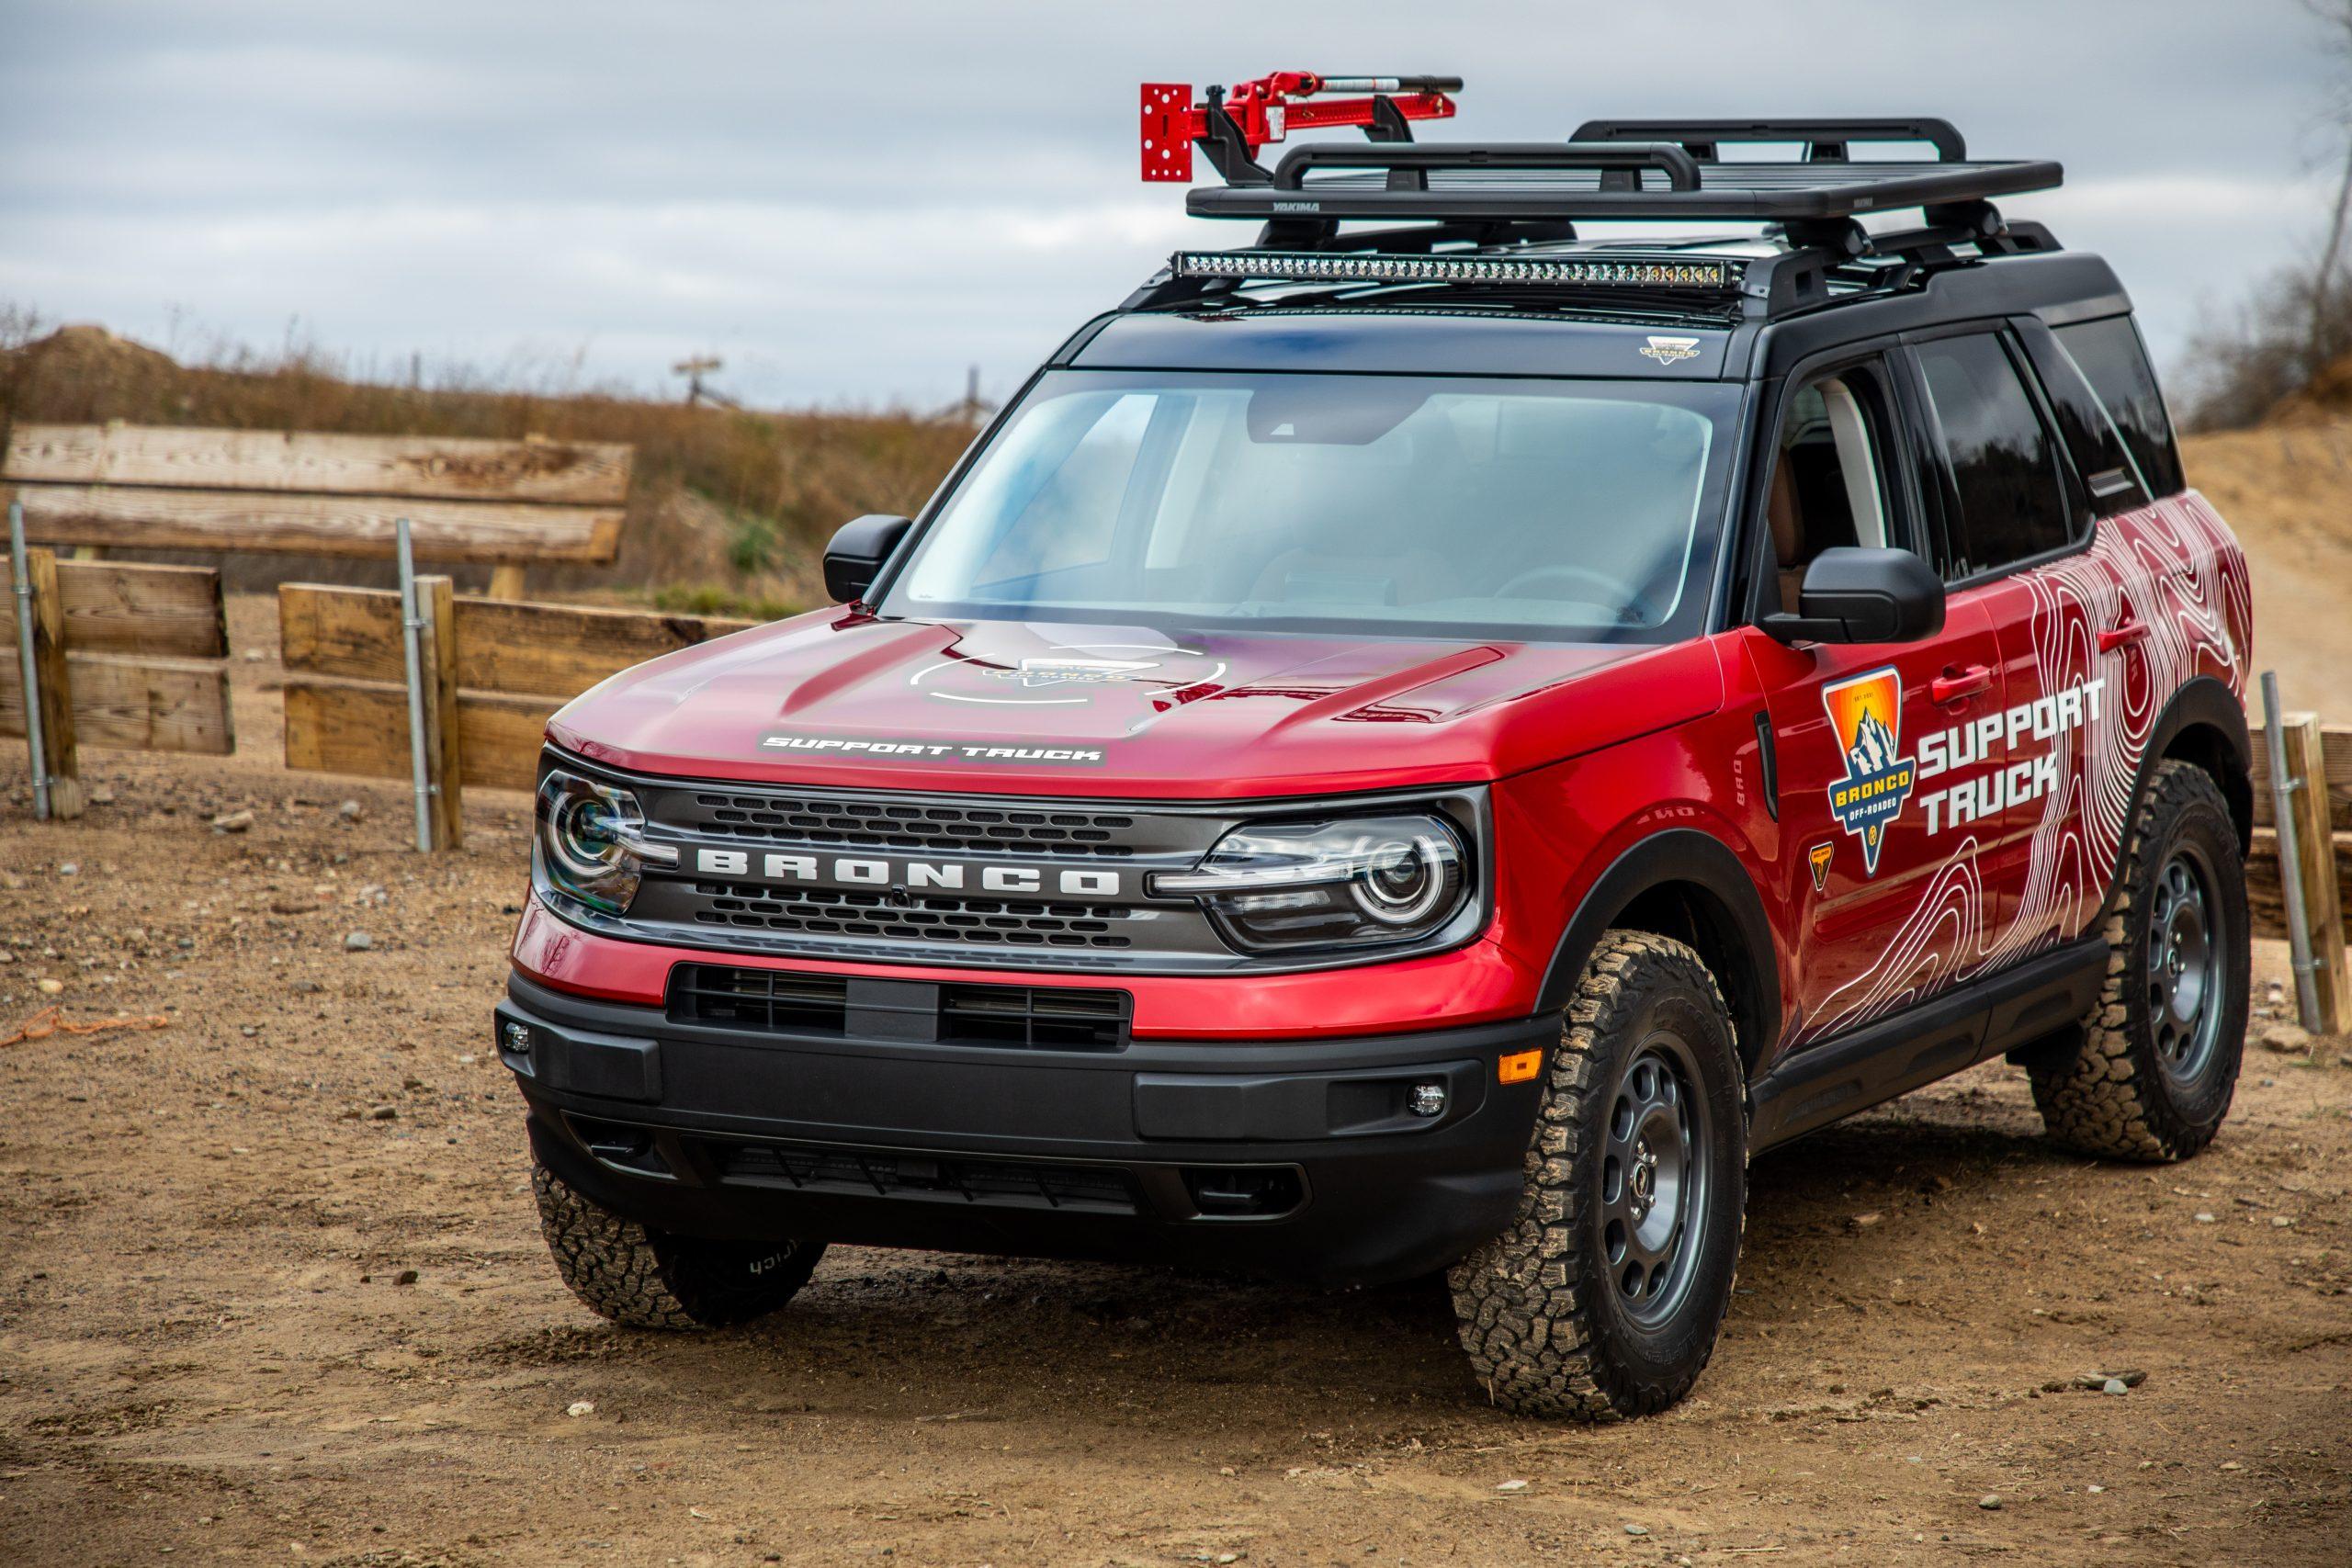 2021 Bronco Sport support truck